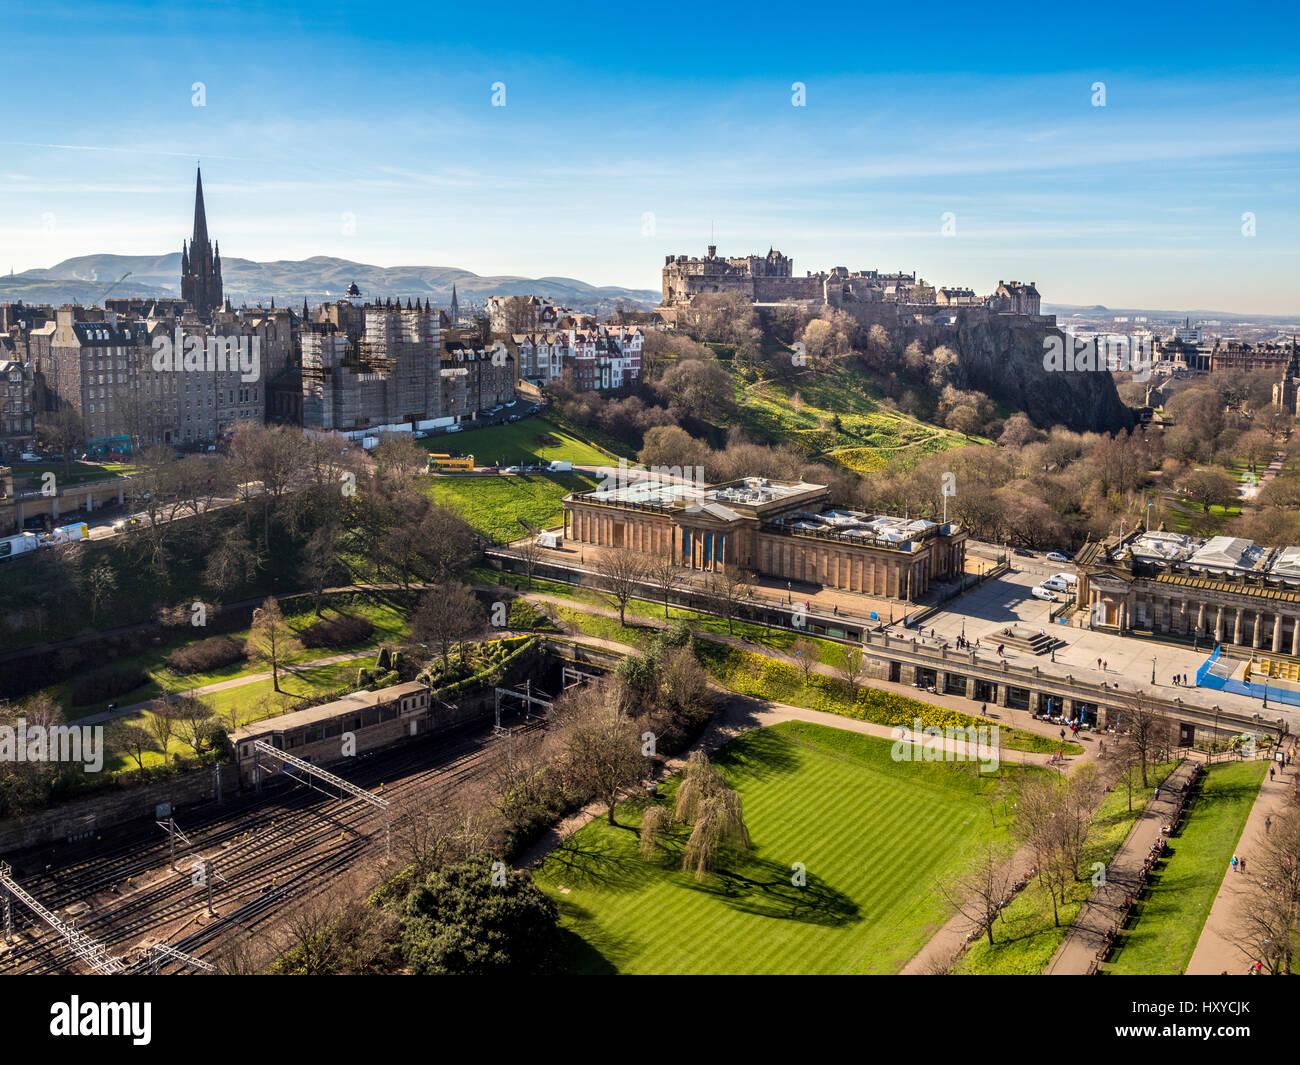 Edinburgh Castle. Scottish National Gallery, Edinburgh, Scotland, UK. - Stock Image